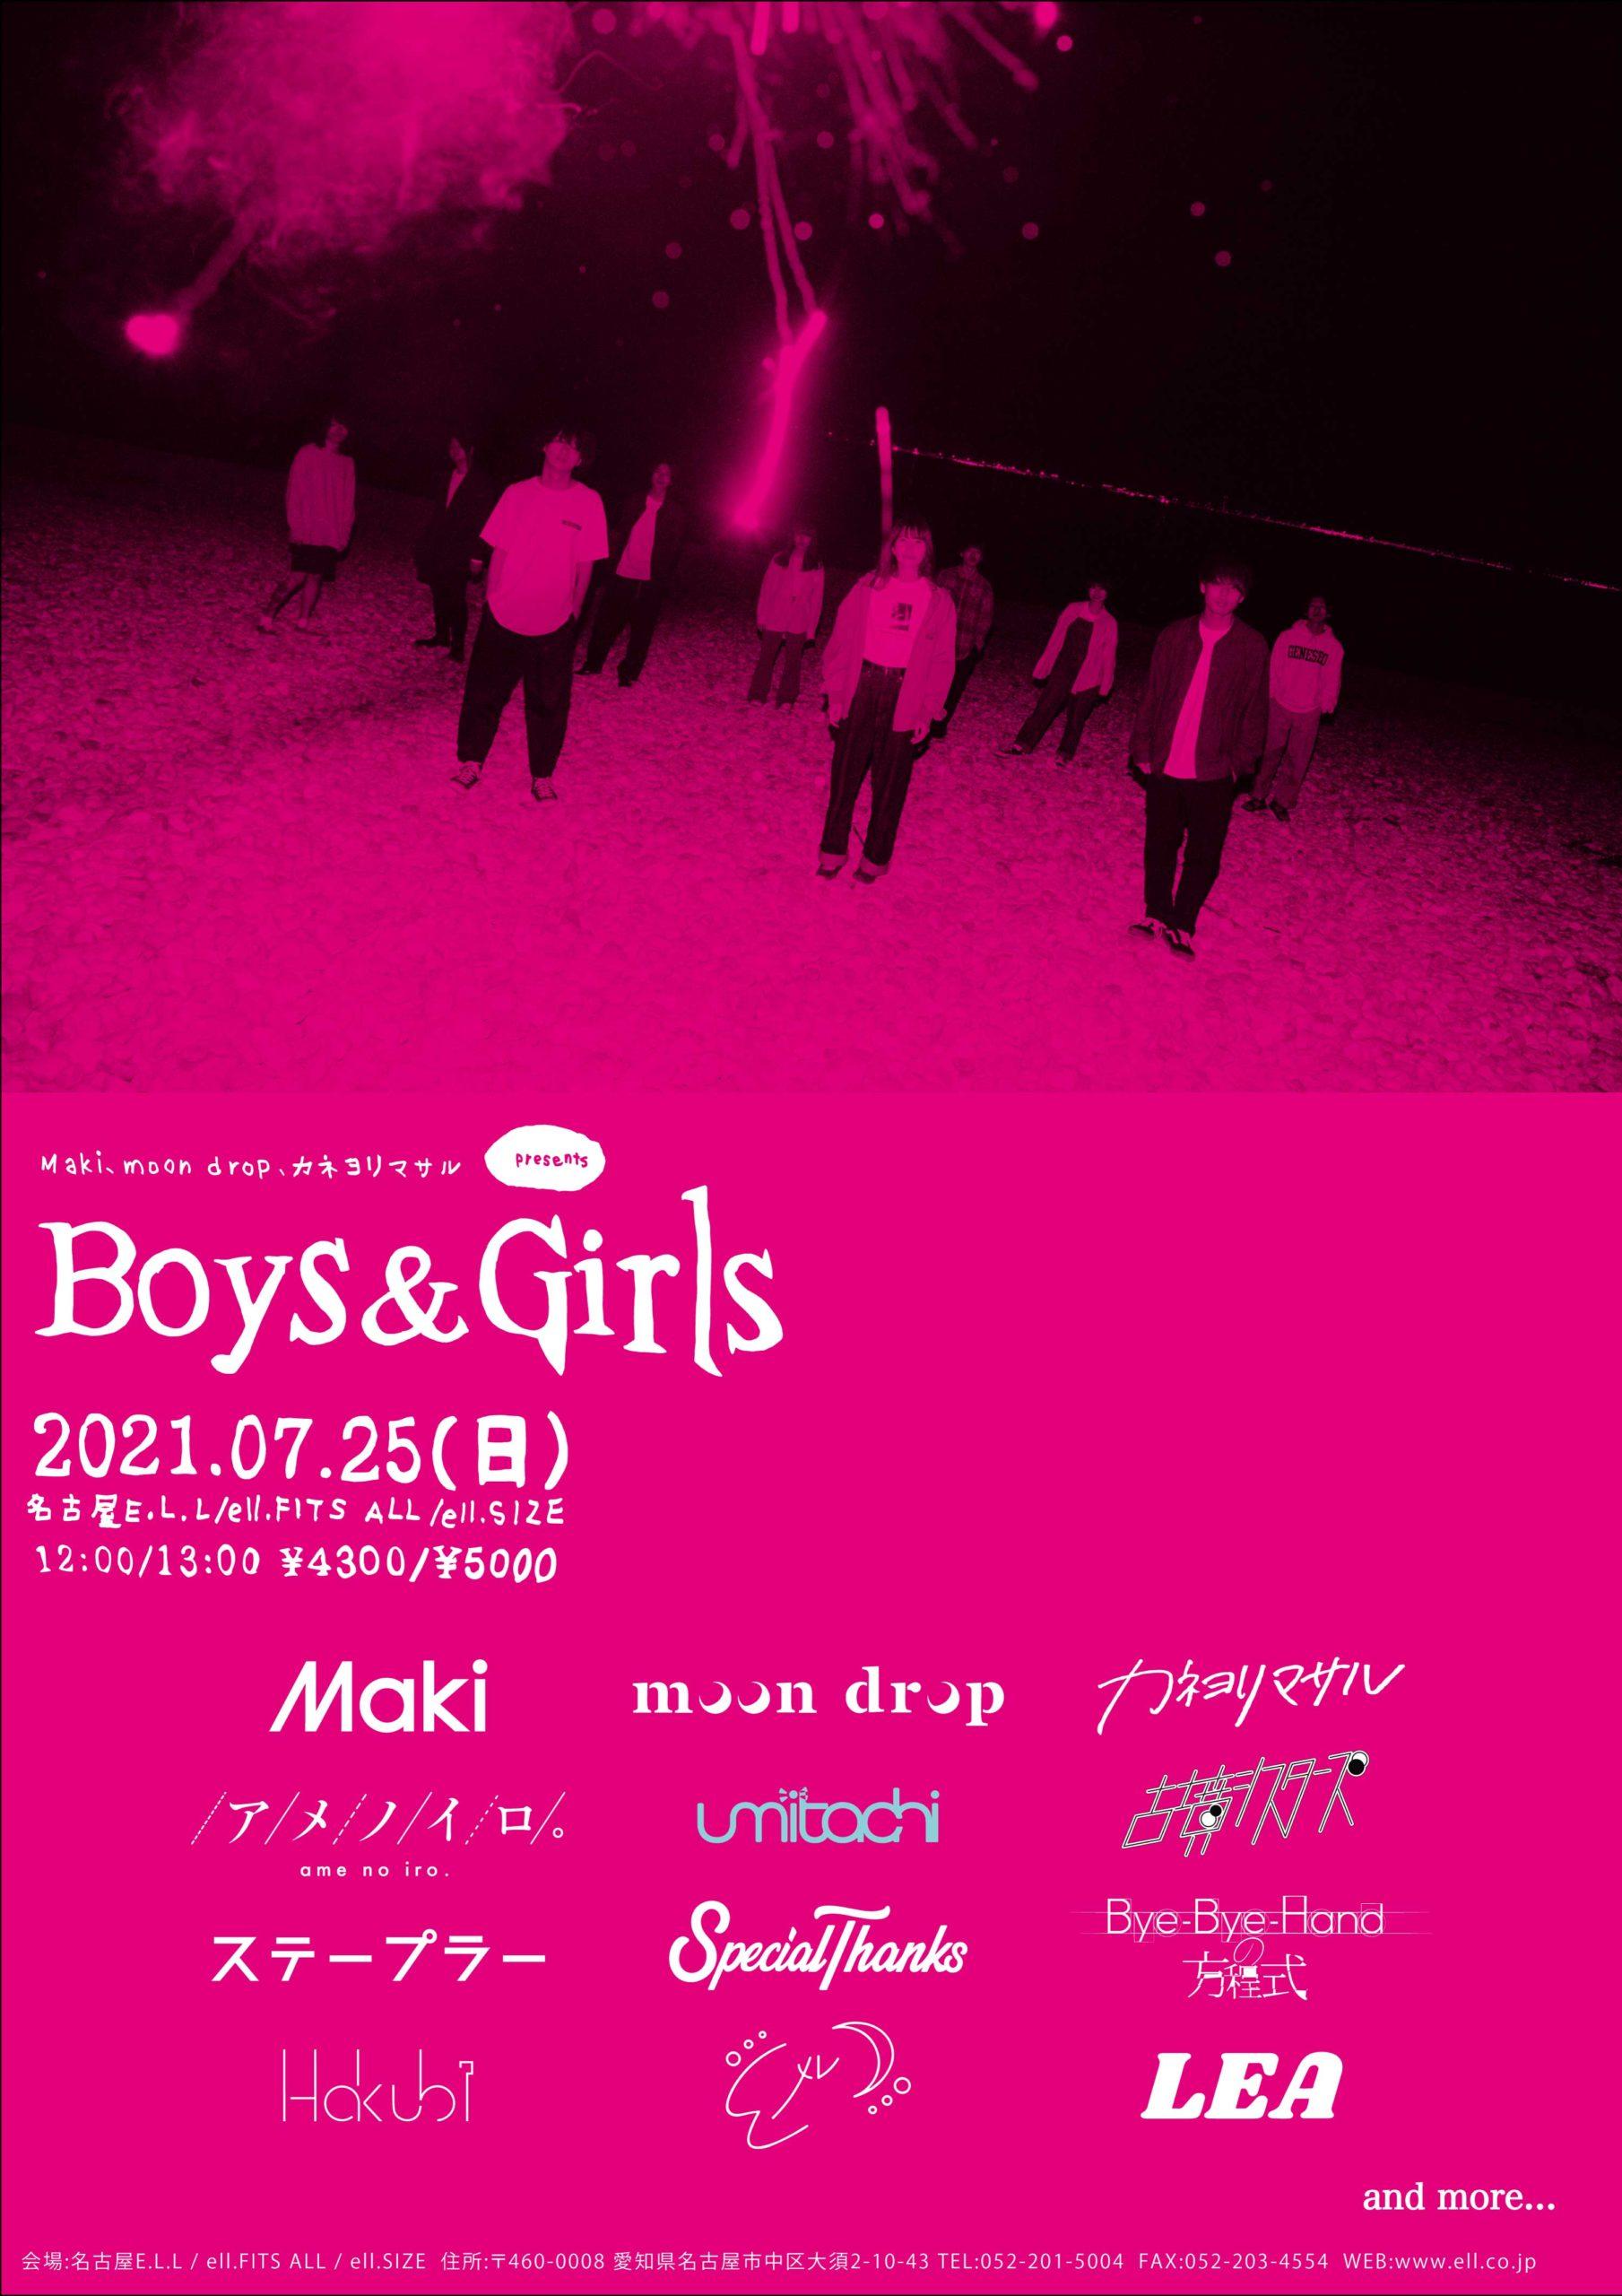 Maki & moon drop & カネヨリマサル presents  【Boys & Girls】